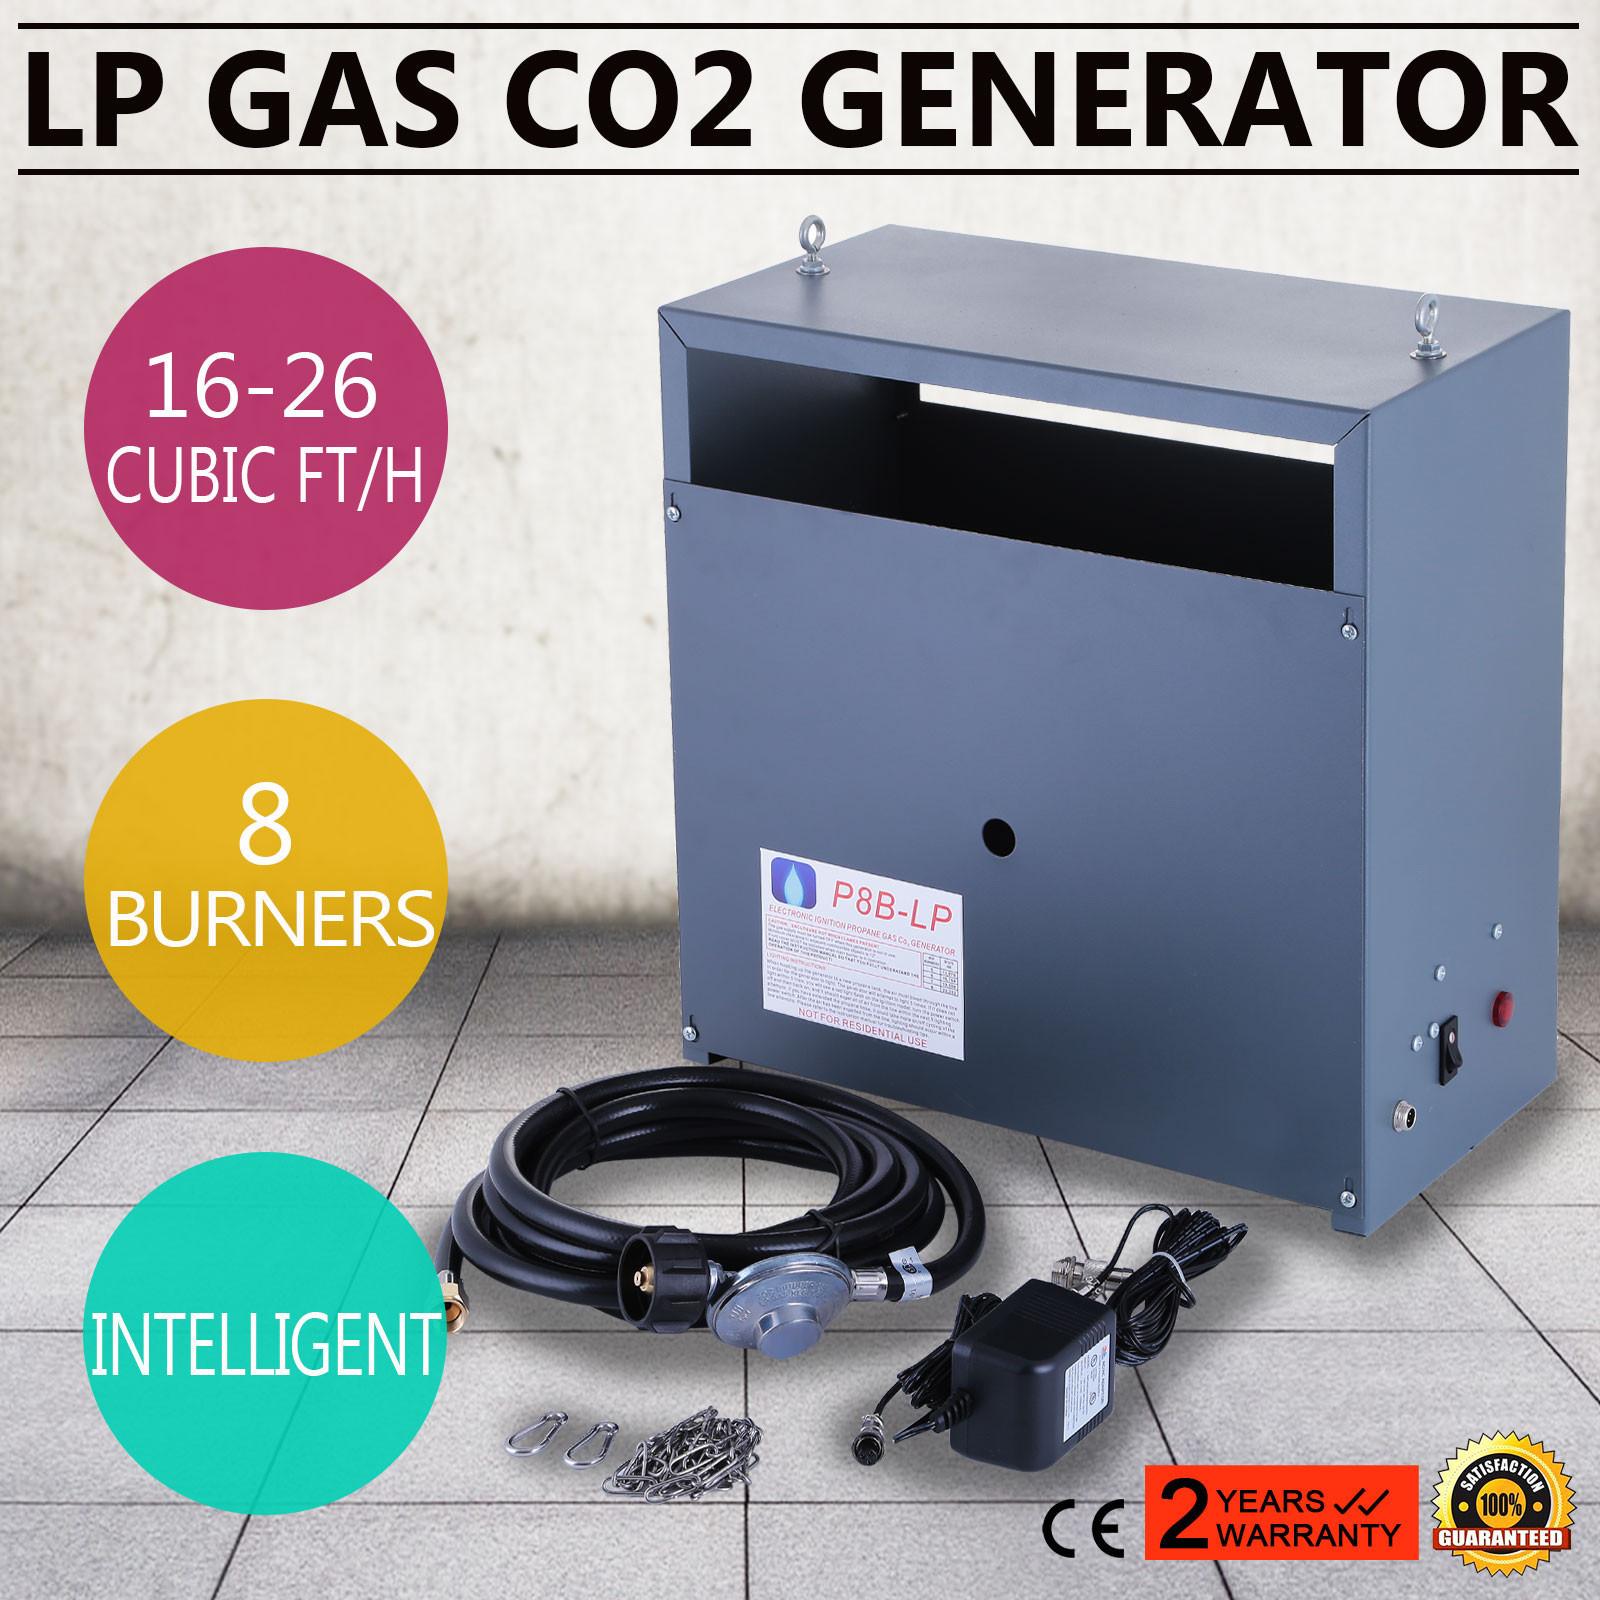 Hydroponic Grow CO2 Generator 8 Burner LP Gas 8 Burners Greenhouse